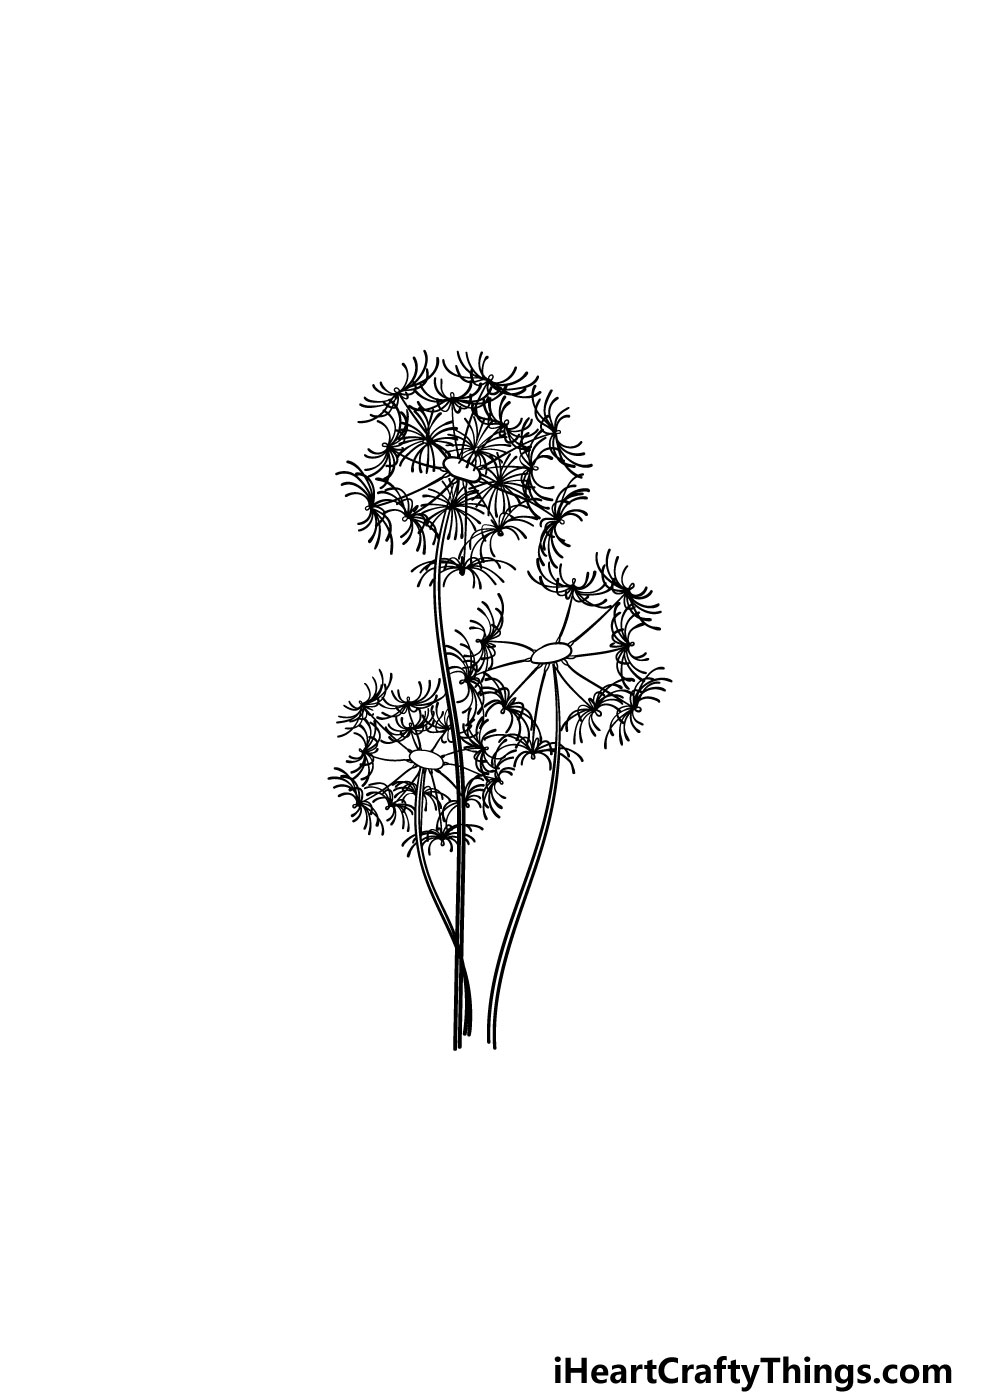 drawing a dandelion step 5